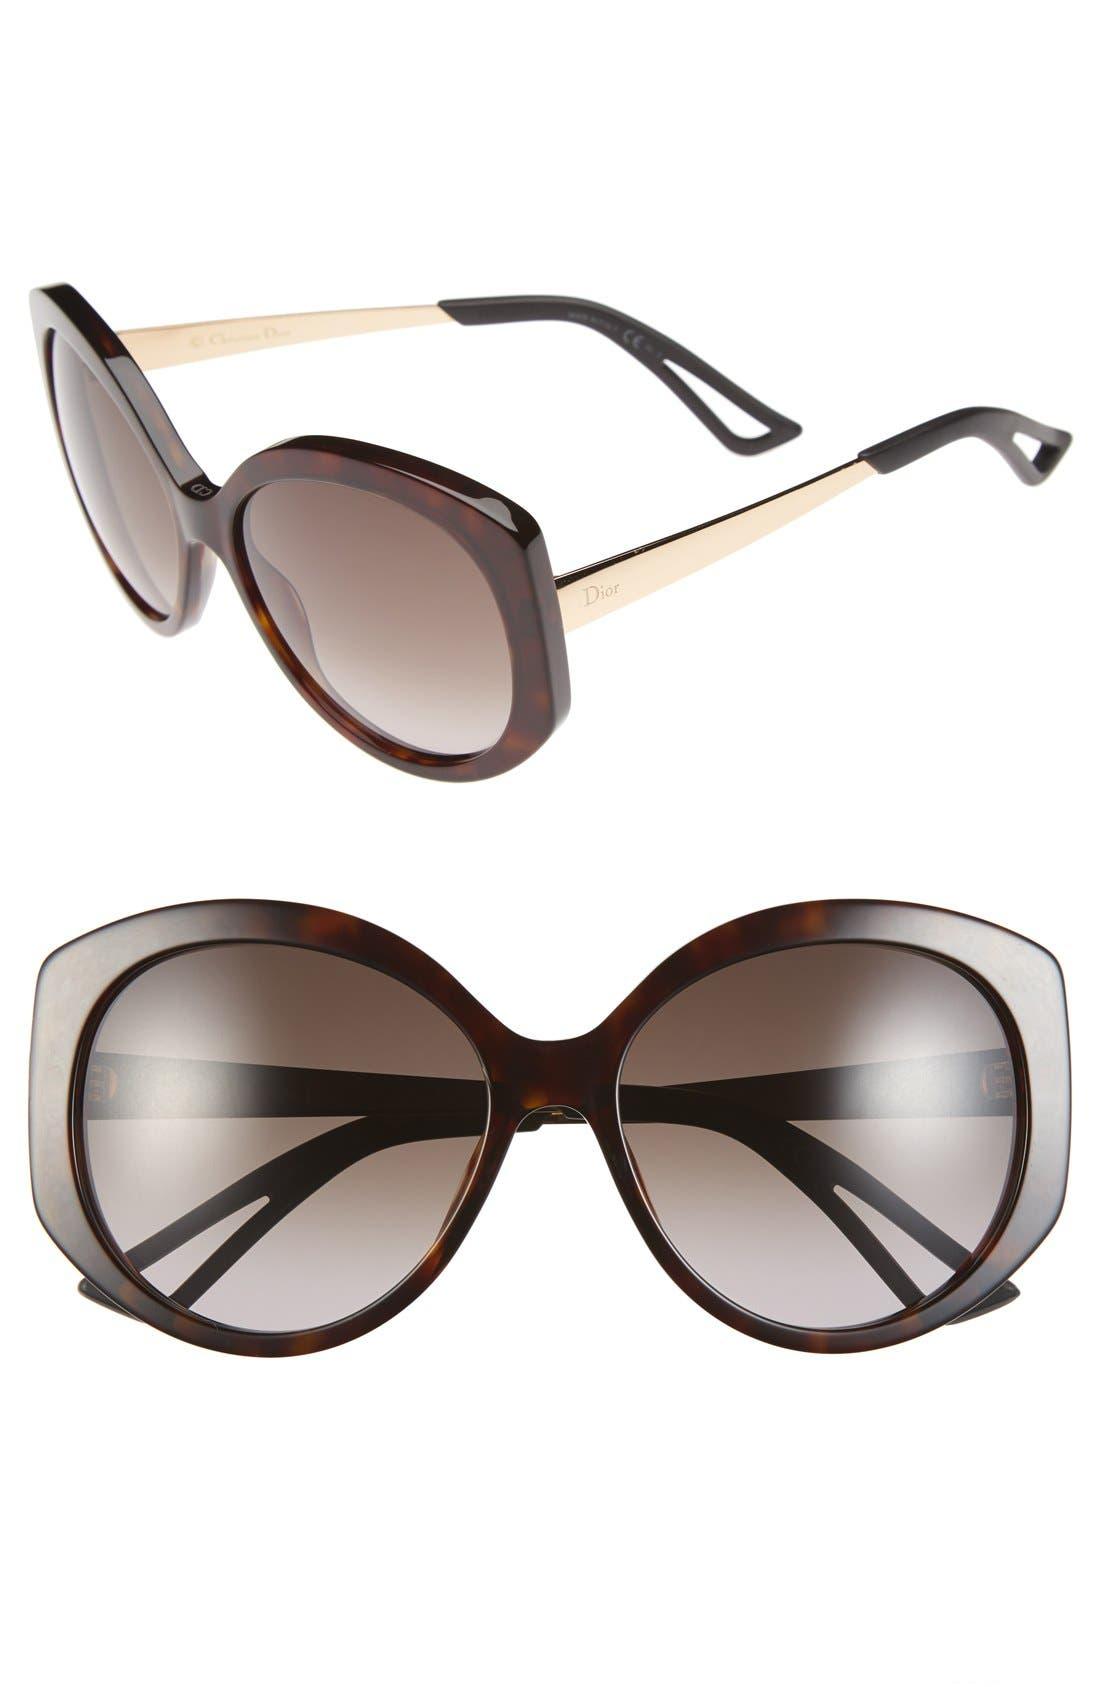 Alternate Image 1 Selected - Dior Extase 1 58mm Sunglasses